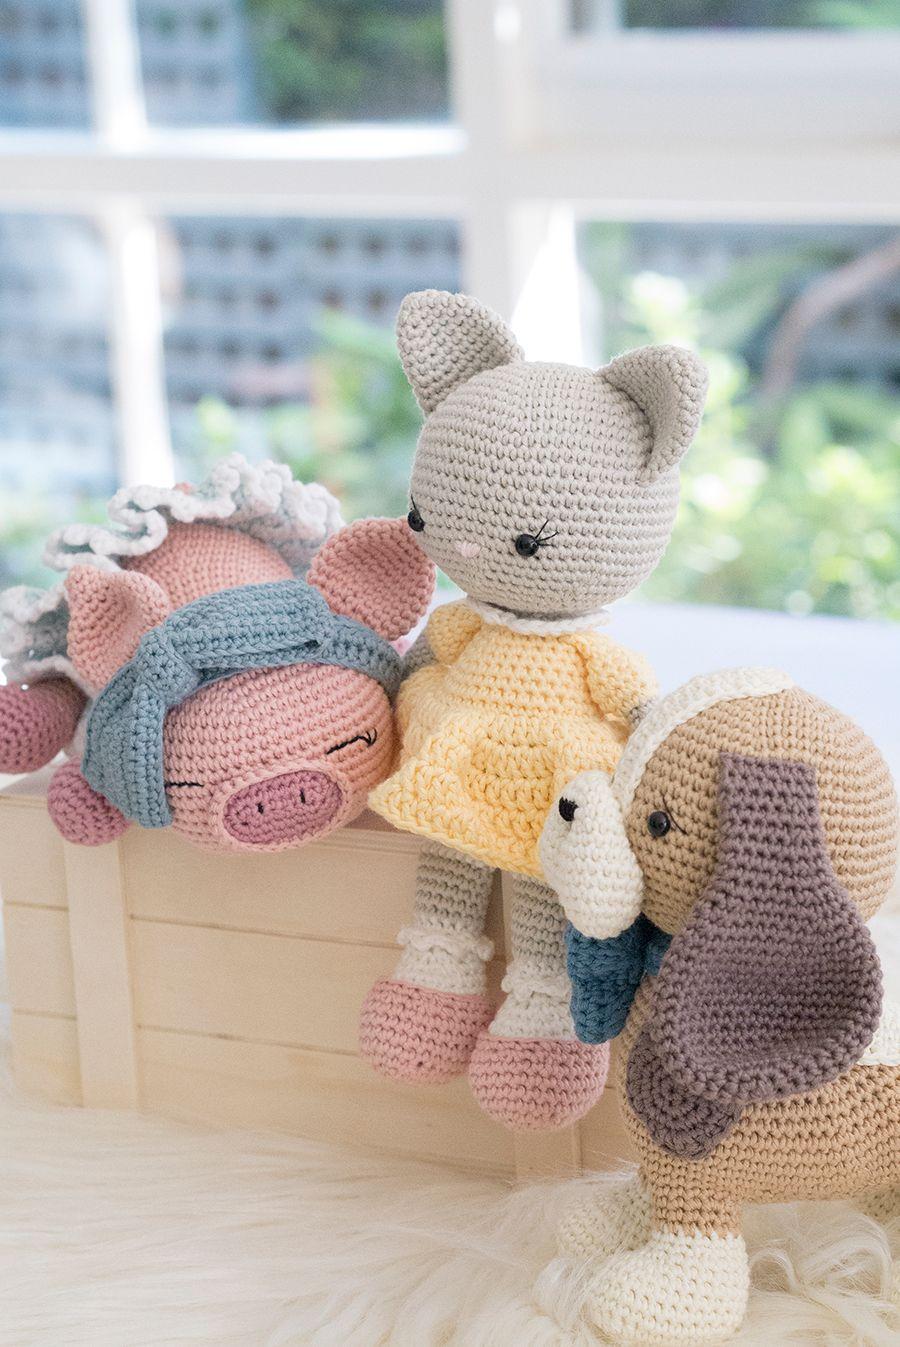 Amigurumi Treasures | Handmade knitting, Crochet books, Amigurumi | 1347x900